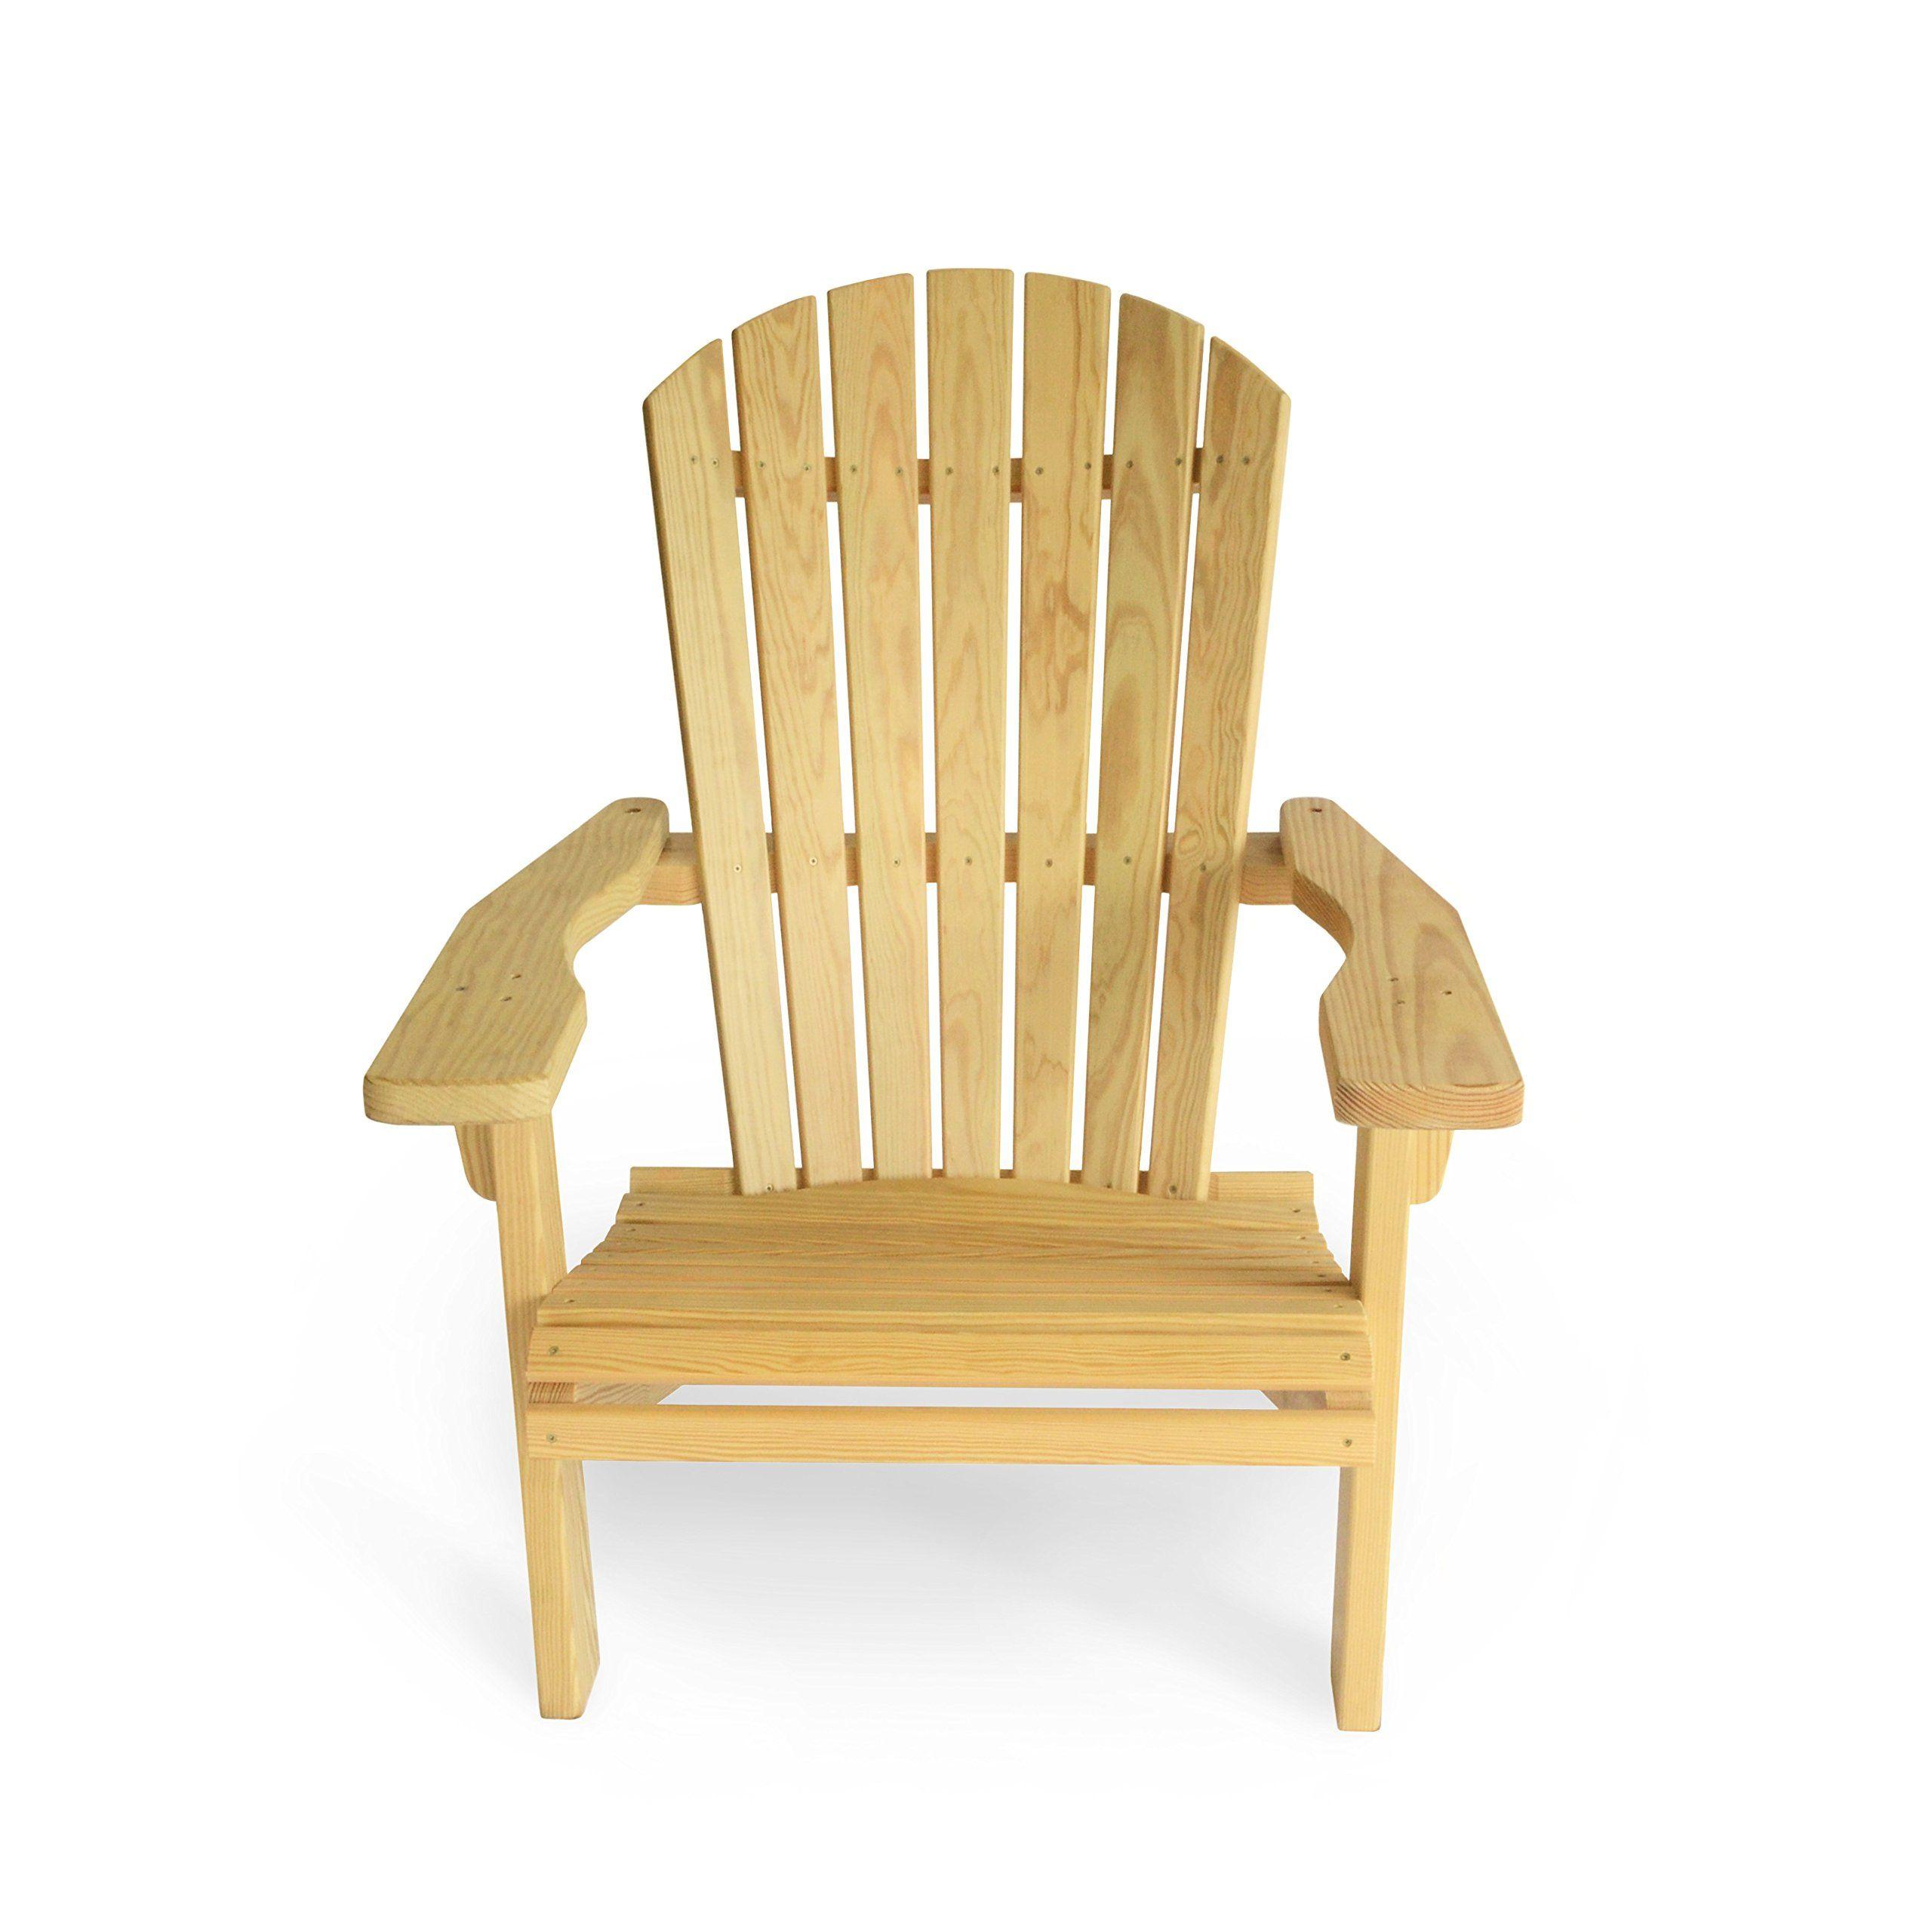 Adirondack chair natural treated pine made of treated pine